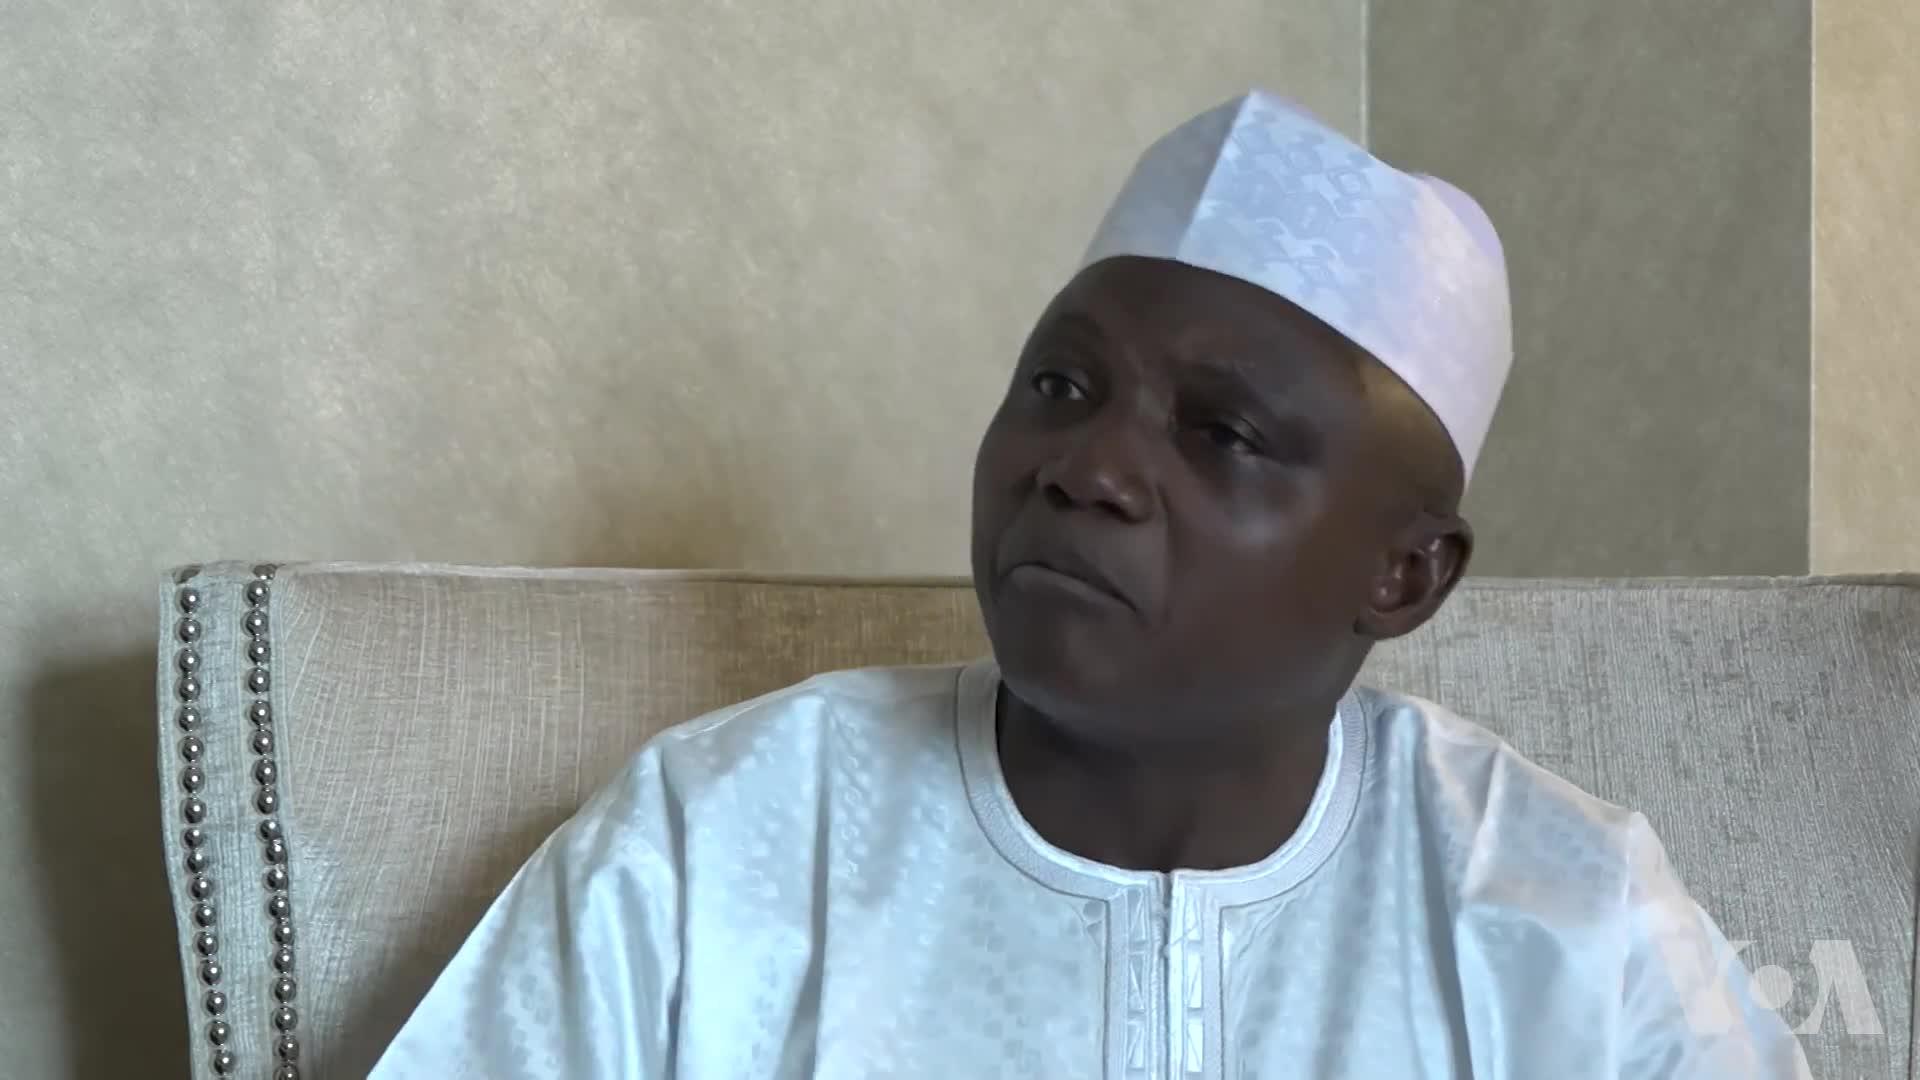 garba shehu 3 - Nigeria Did Not Cut Ties With Taiwan, Says Presidency